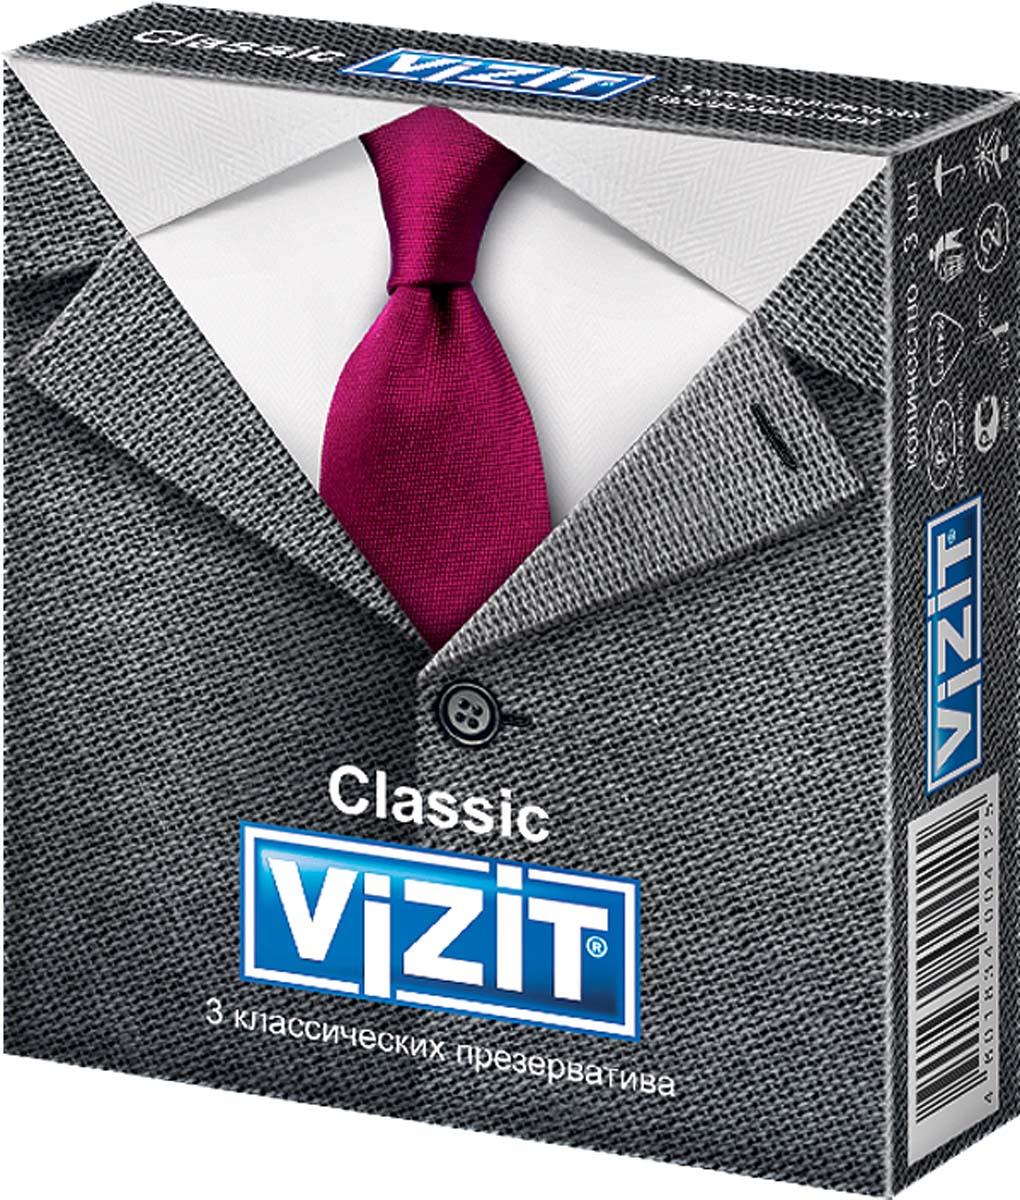 VIZIT Презервативы Classic, классические, 3 шт liberator retail black label wedge черная любовь